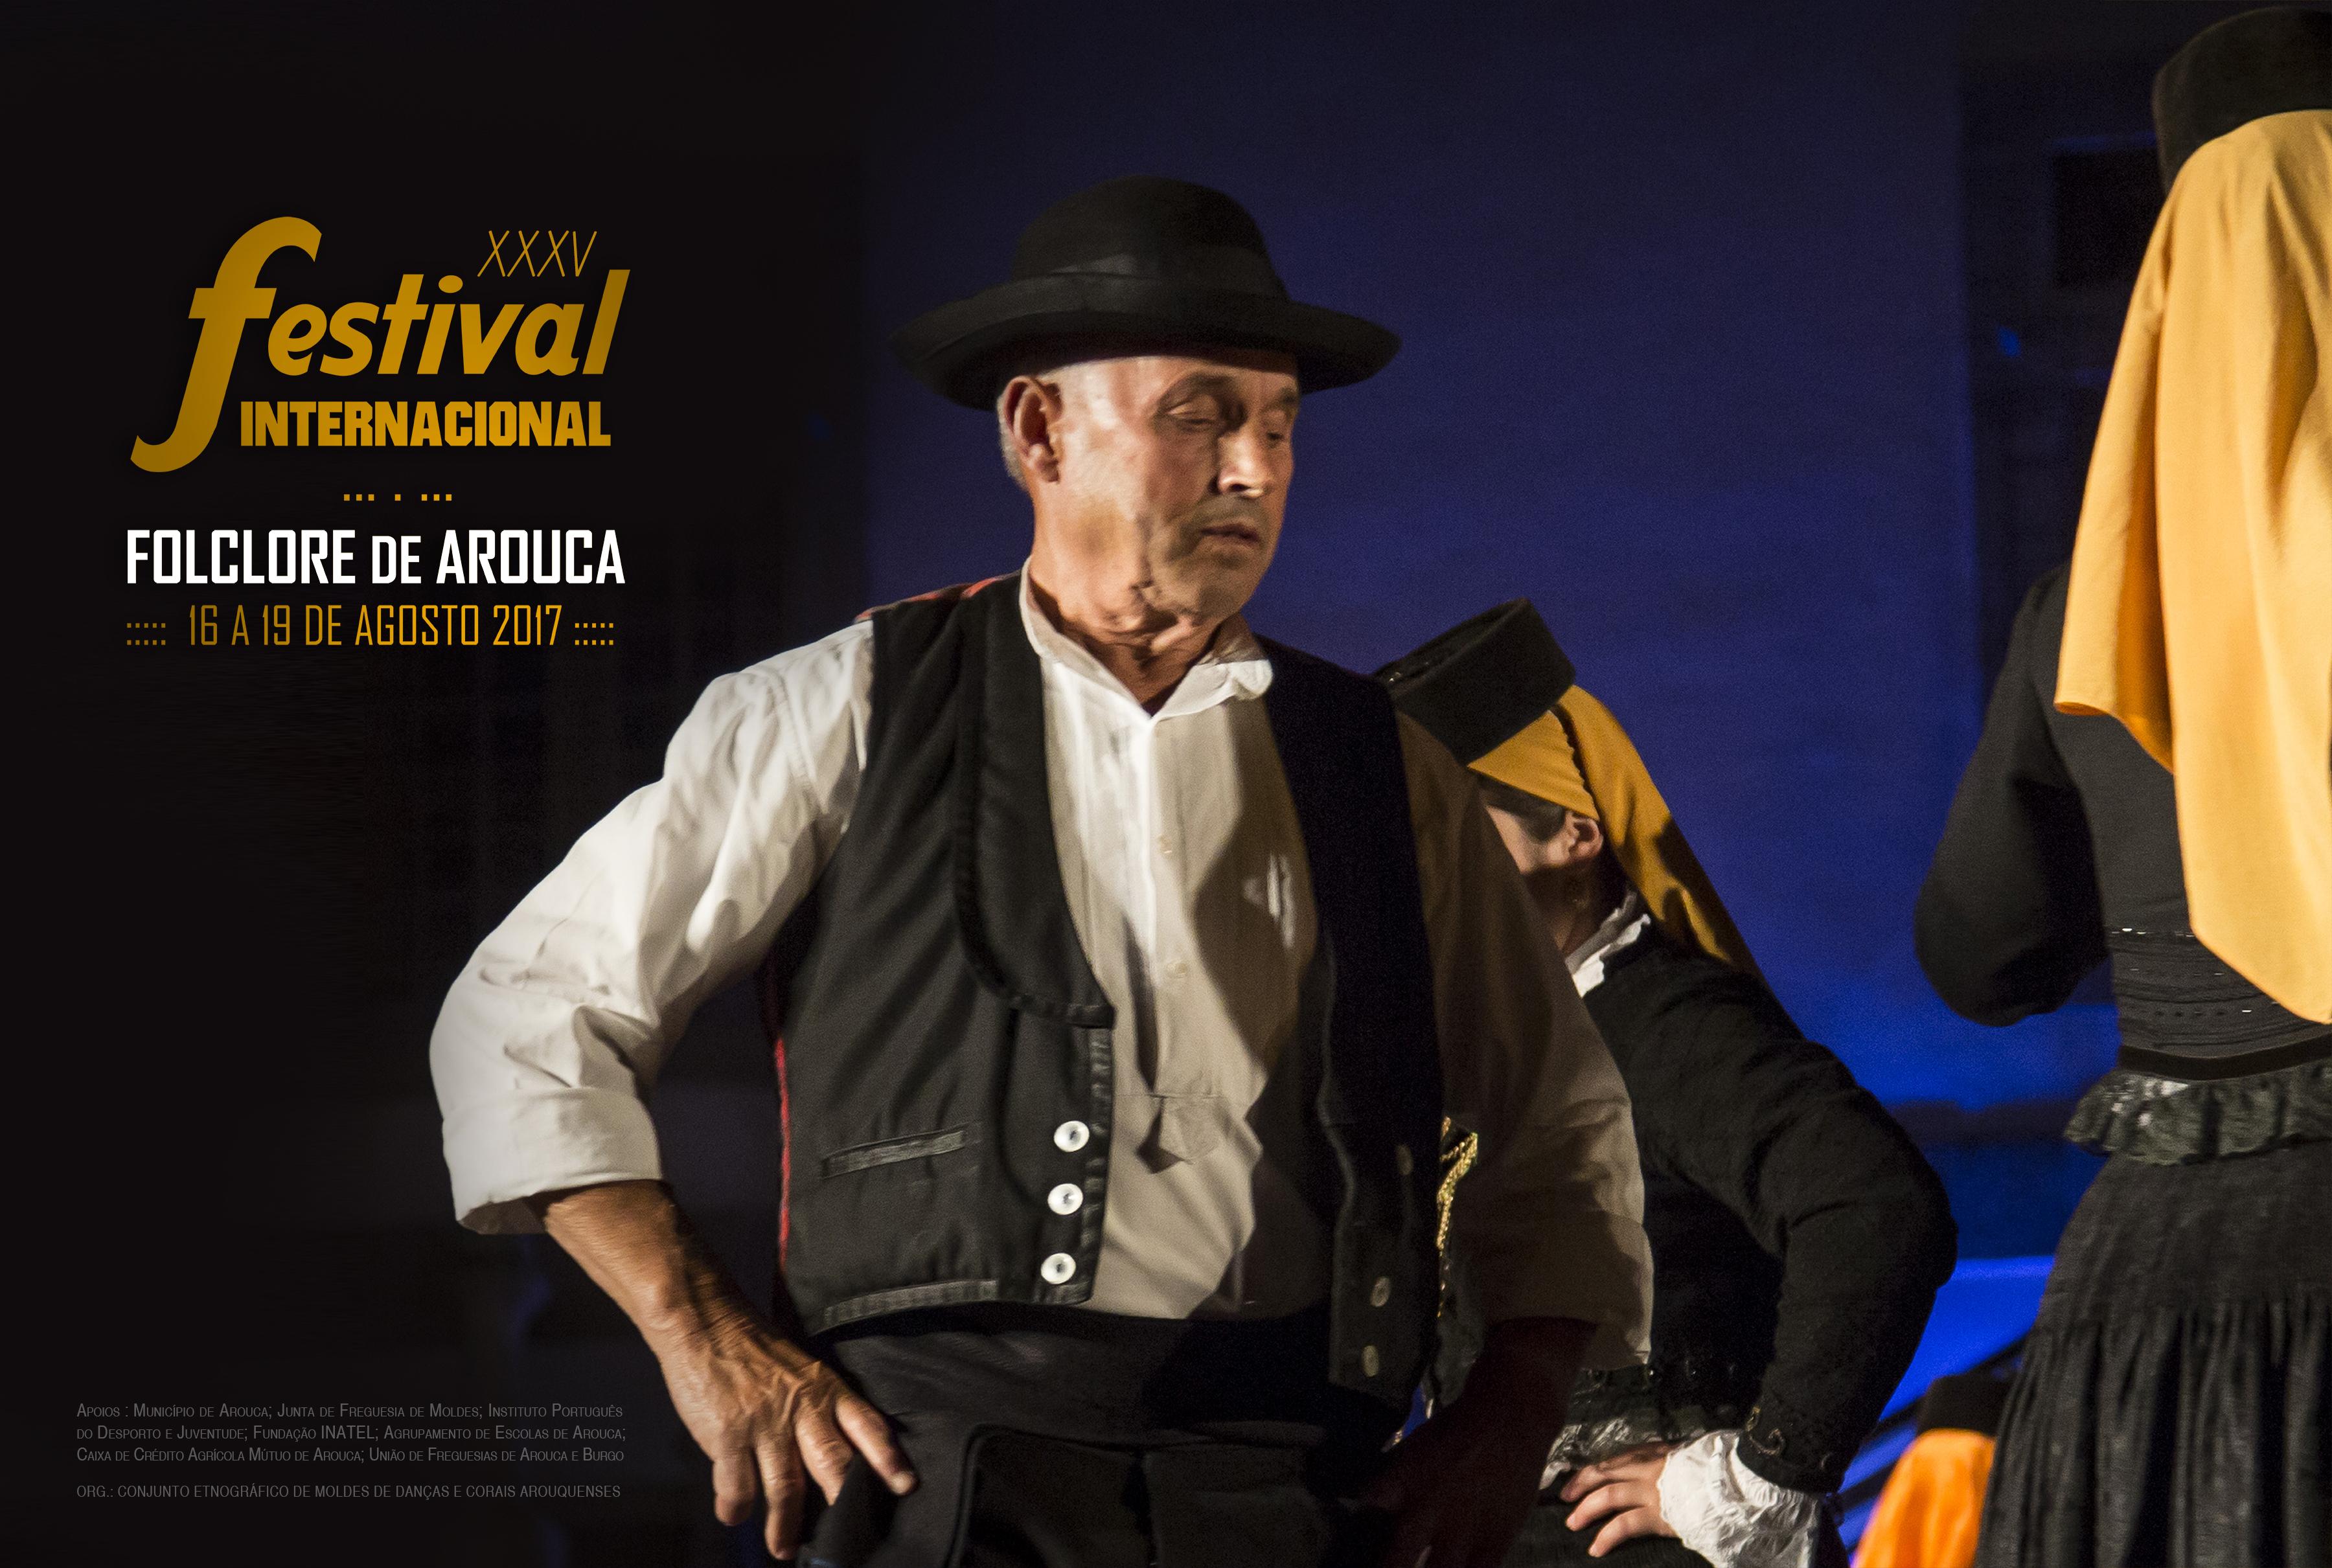 35 anos de Festival Internacional de Folclore de Arouca